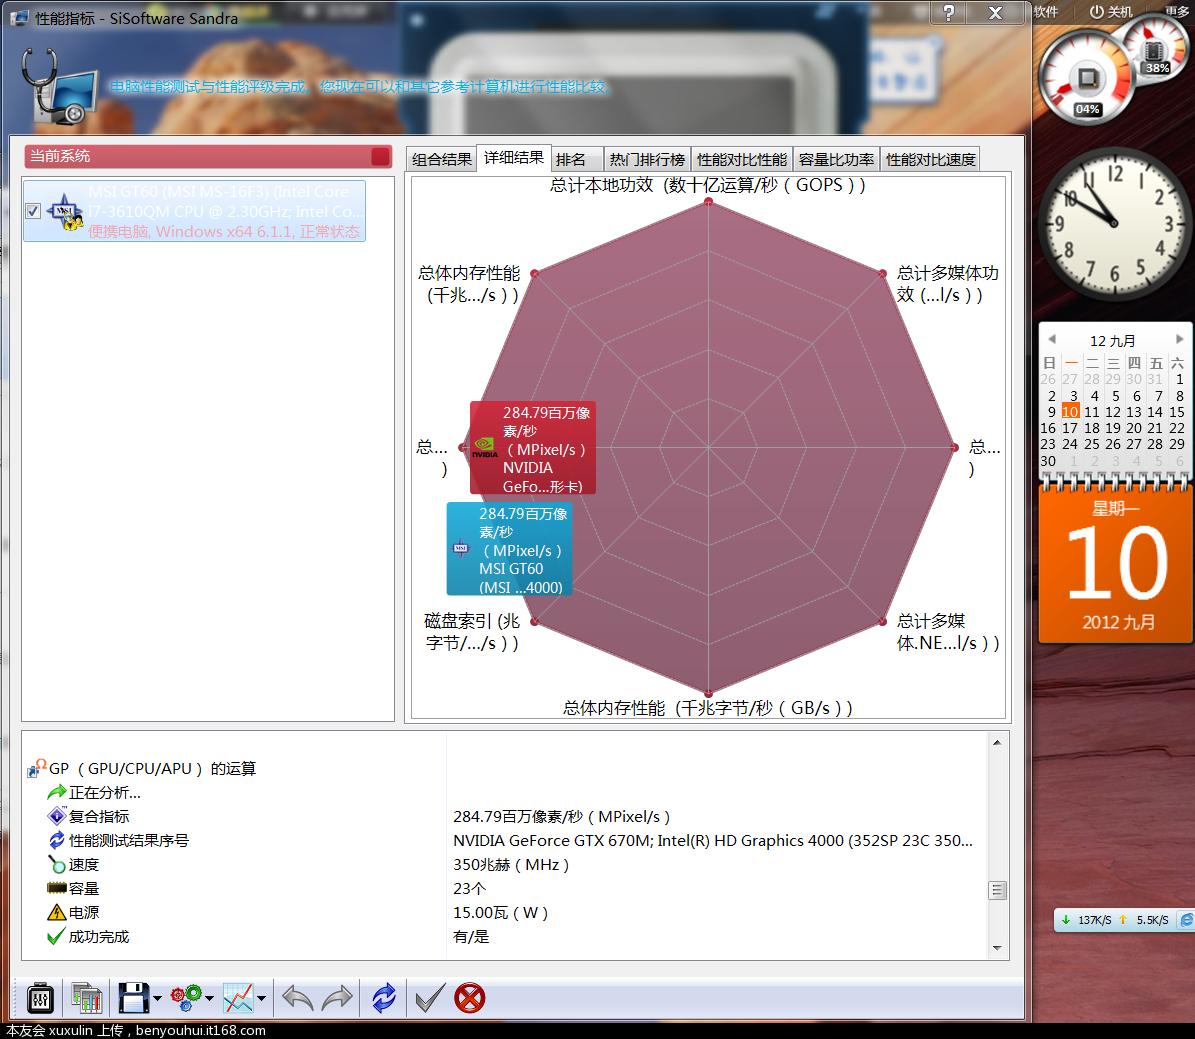 Sisoftware Sandra 截图9.PNG